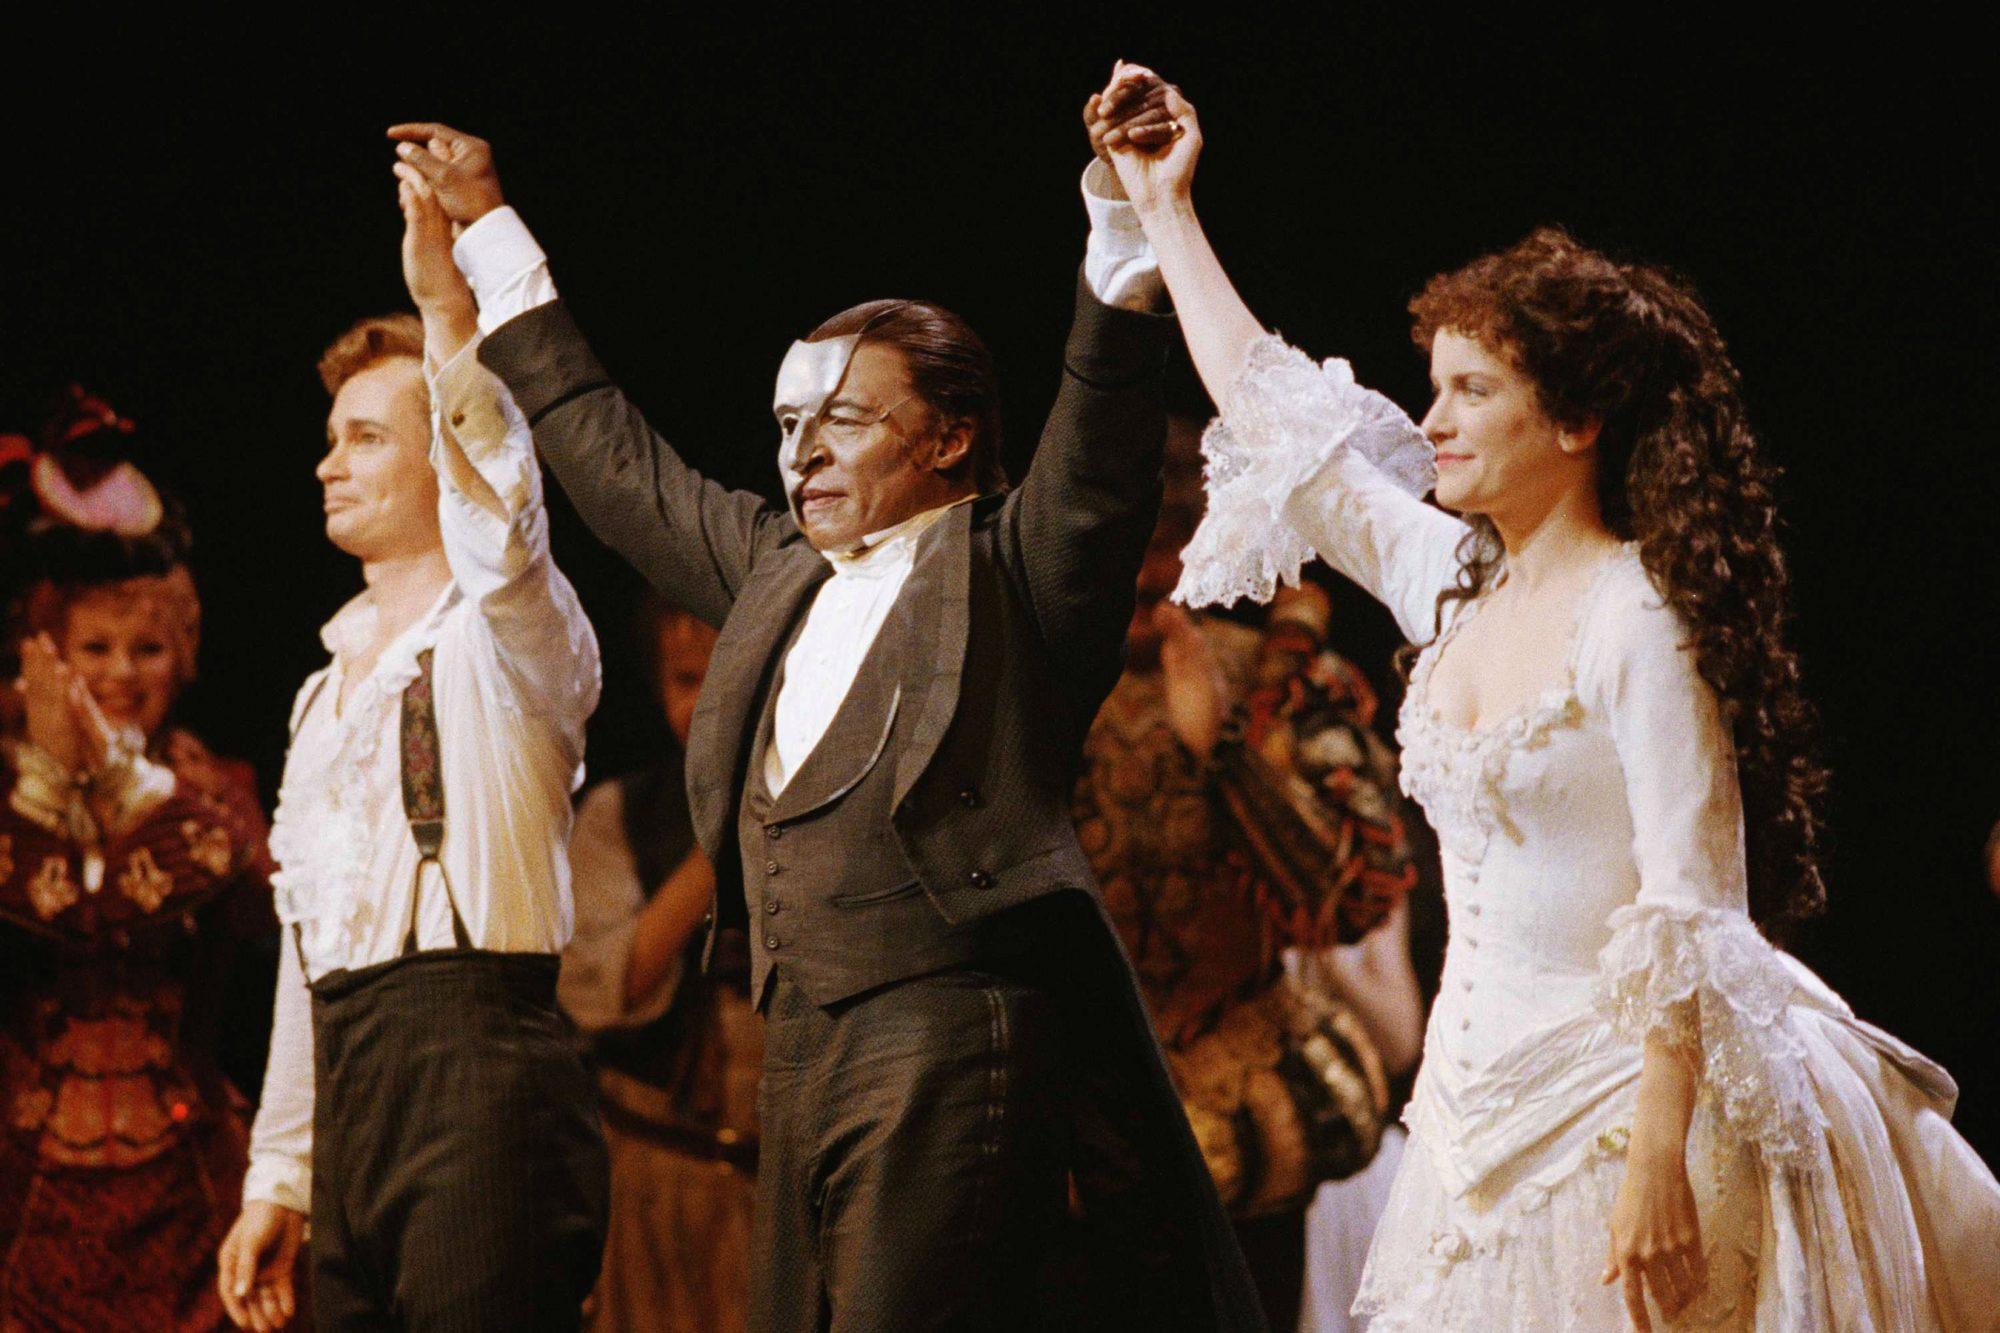 Robert Guillaume As The Phantom 1990, Los Angeles, USA